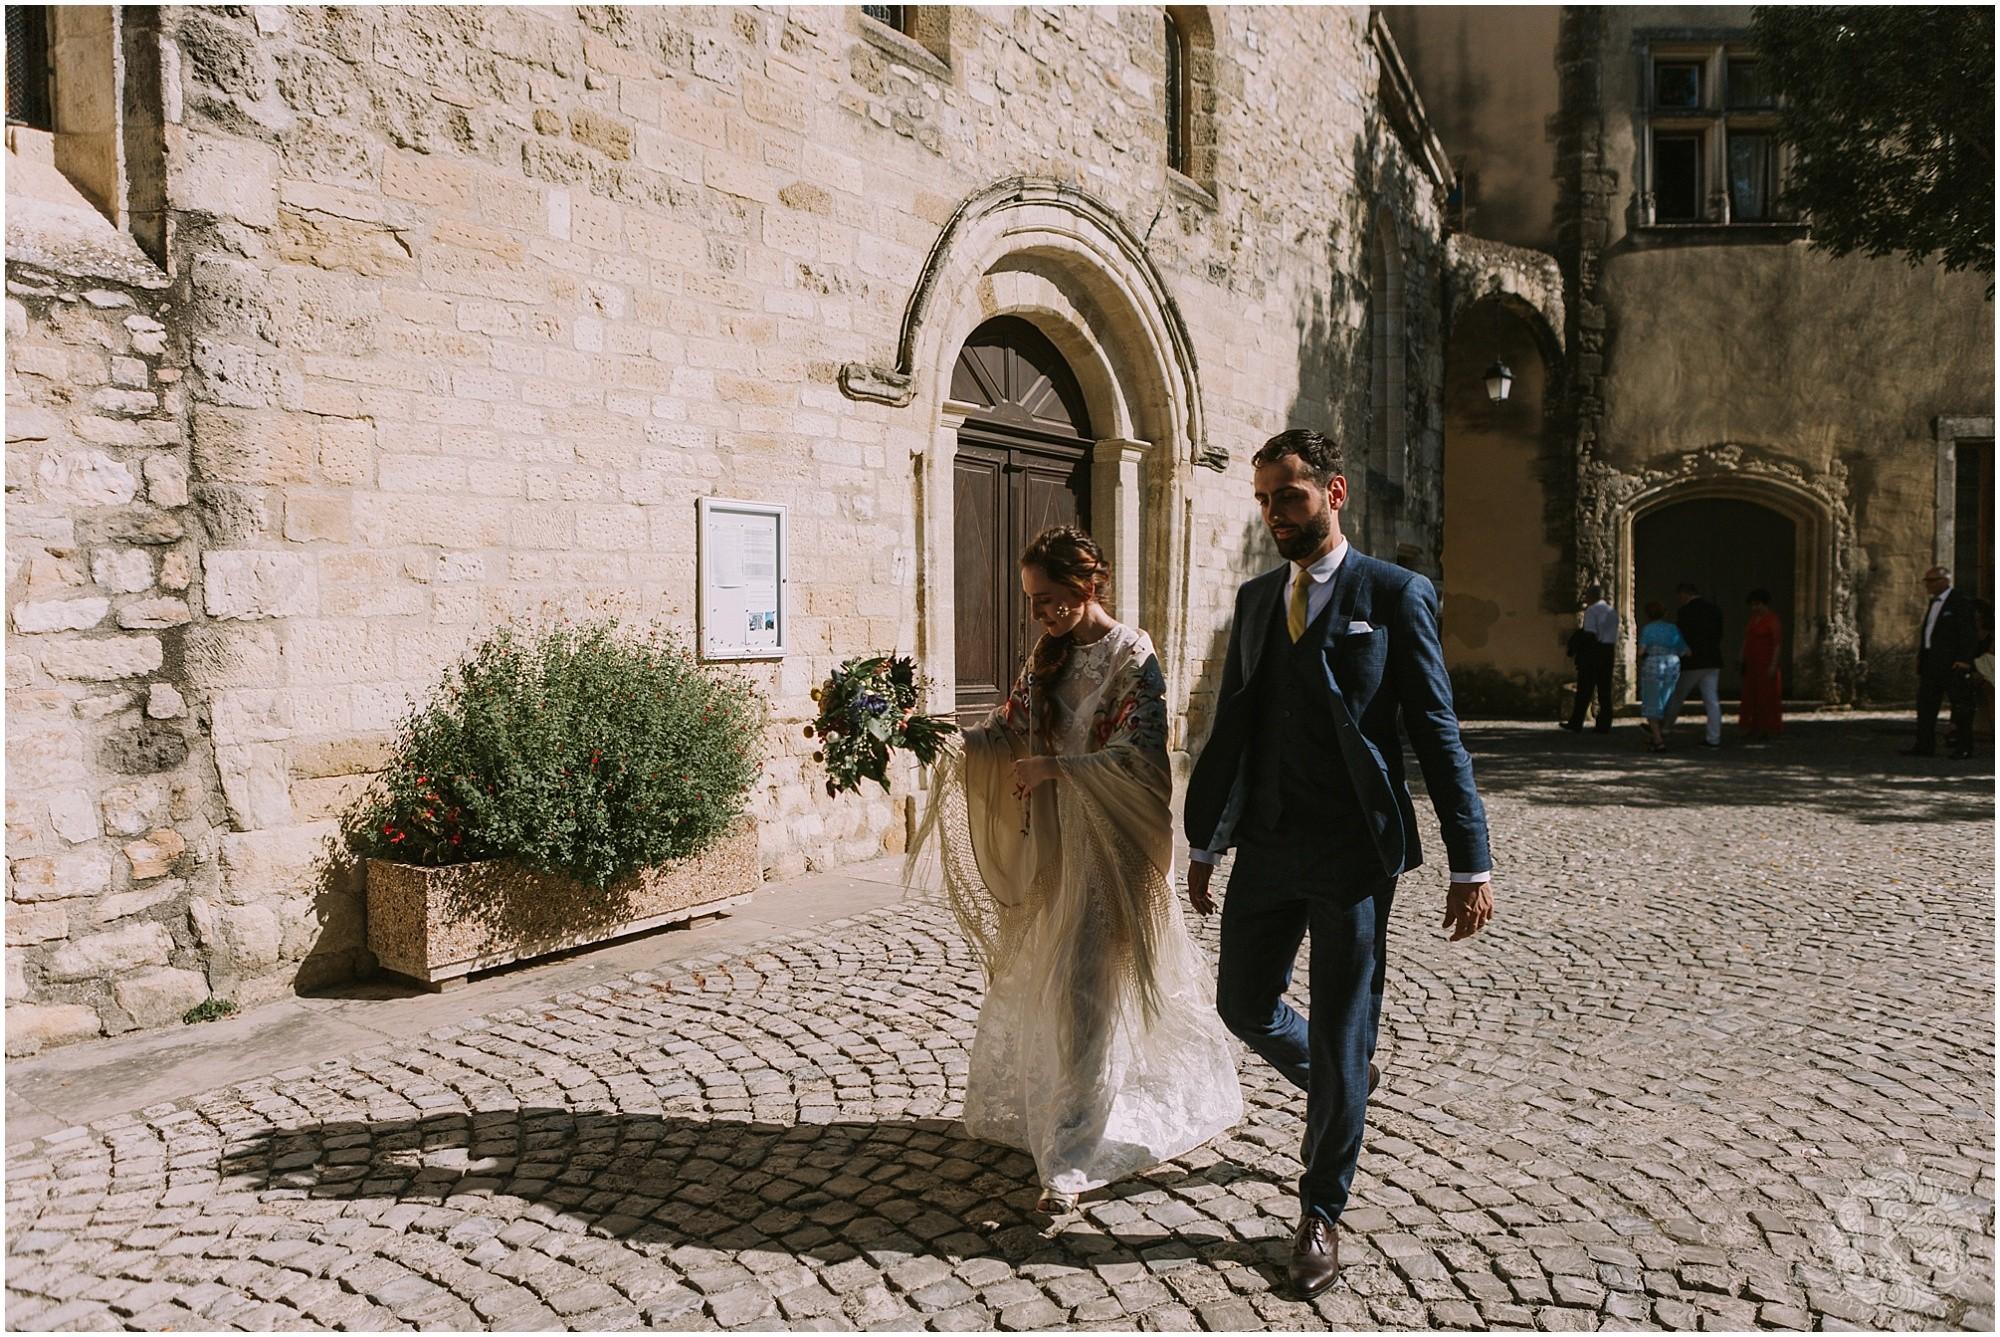 Kateryna-photos-photographe-mariage-vaucluse-provence-avignon-ferme-st-hugues_0041.jpg